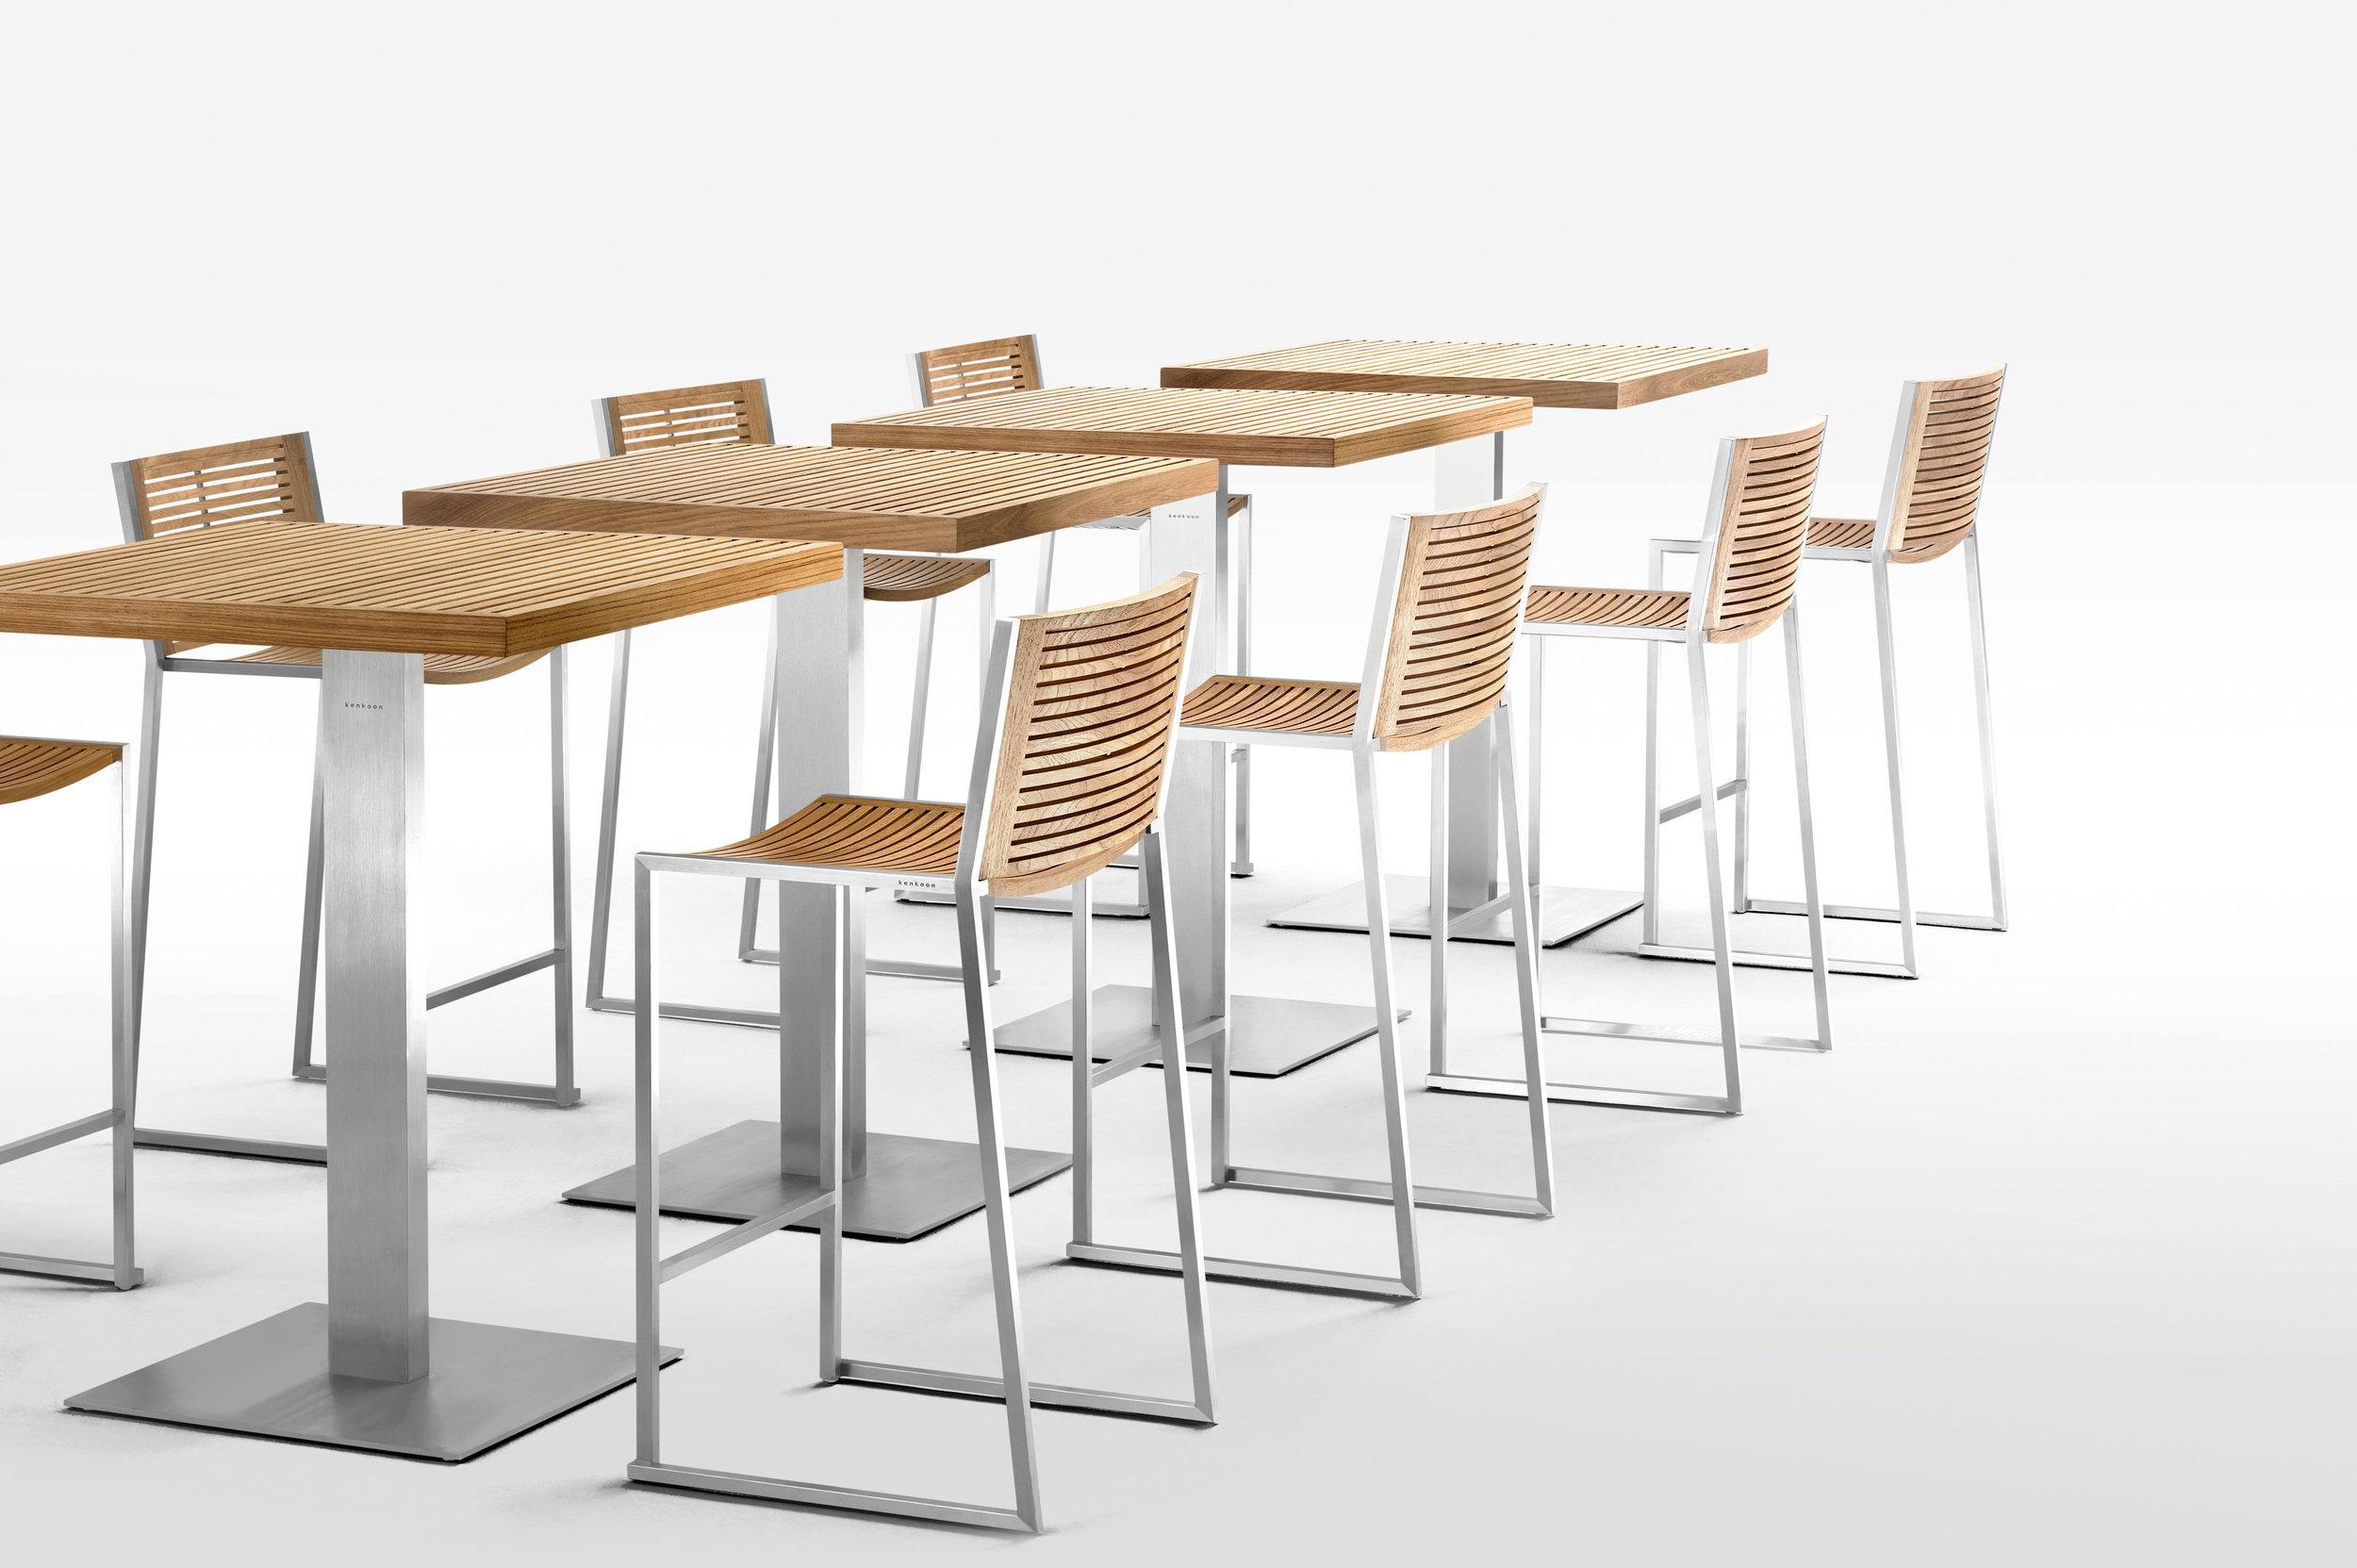 JaneHamleyWells-BEO-Bar-Stools+Tables-Hi-Res-Studio.jpg